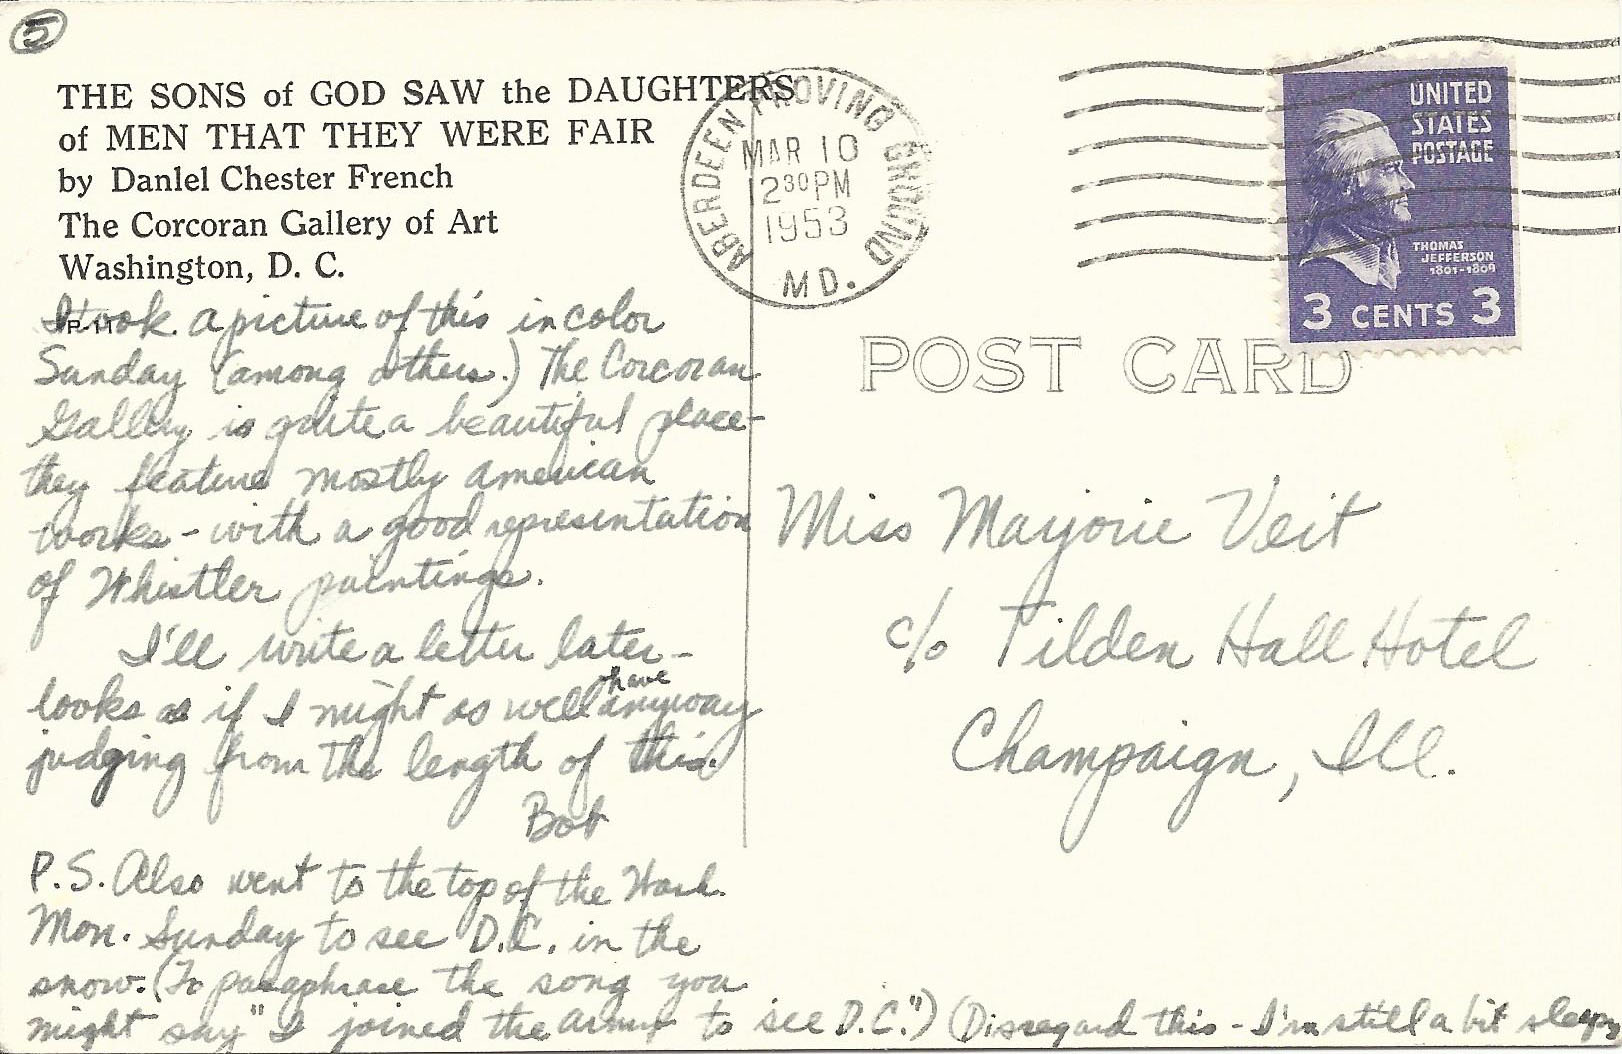 Mar. 10, 1953 (Bob) Page 5, Back